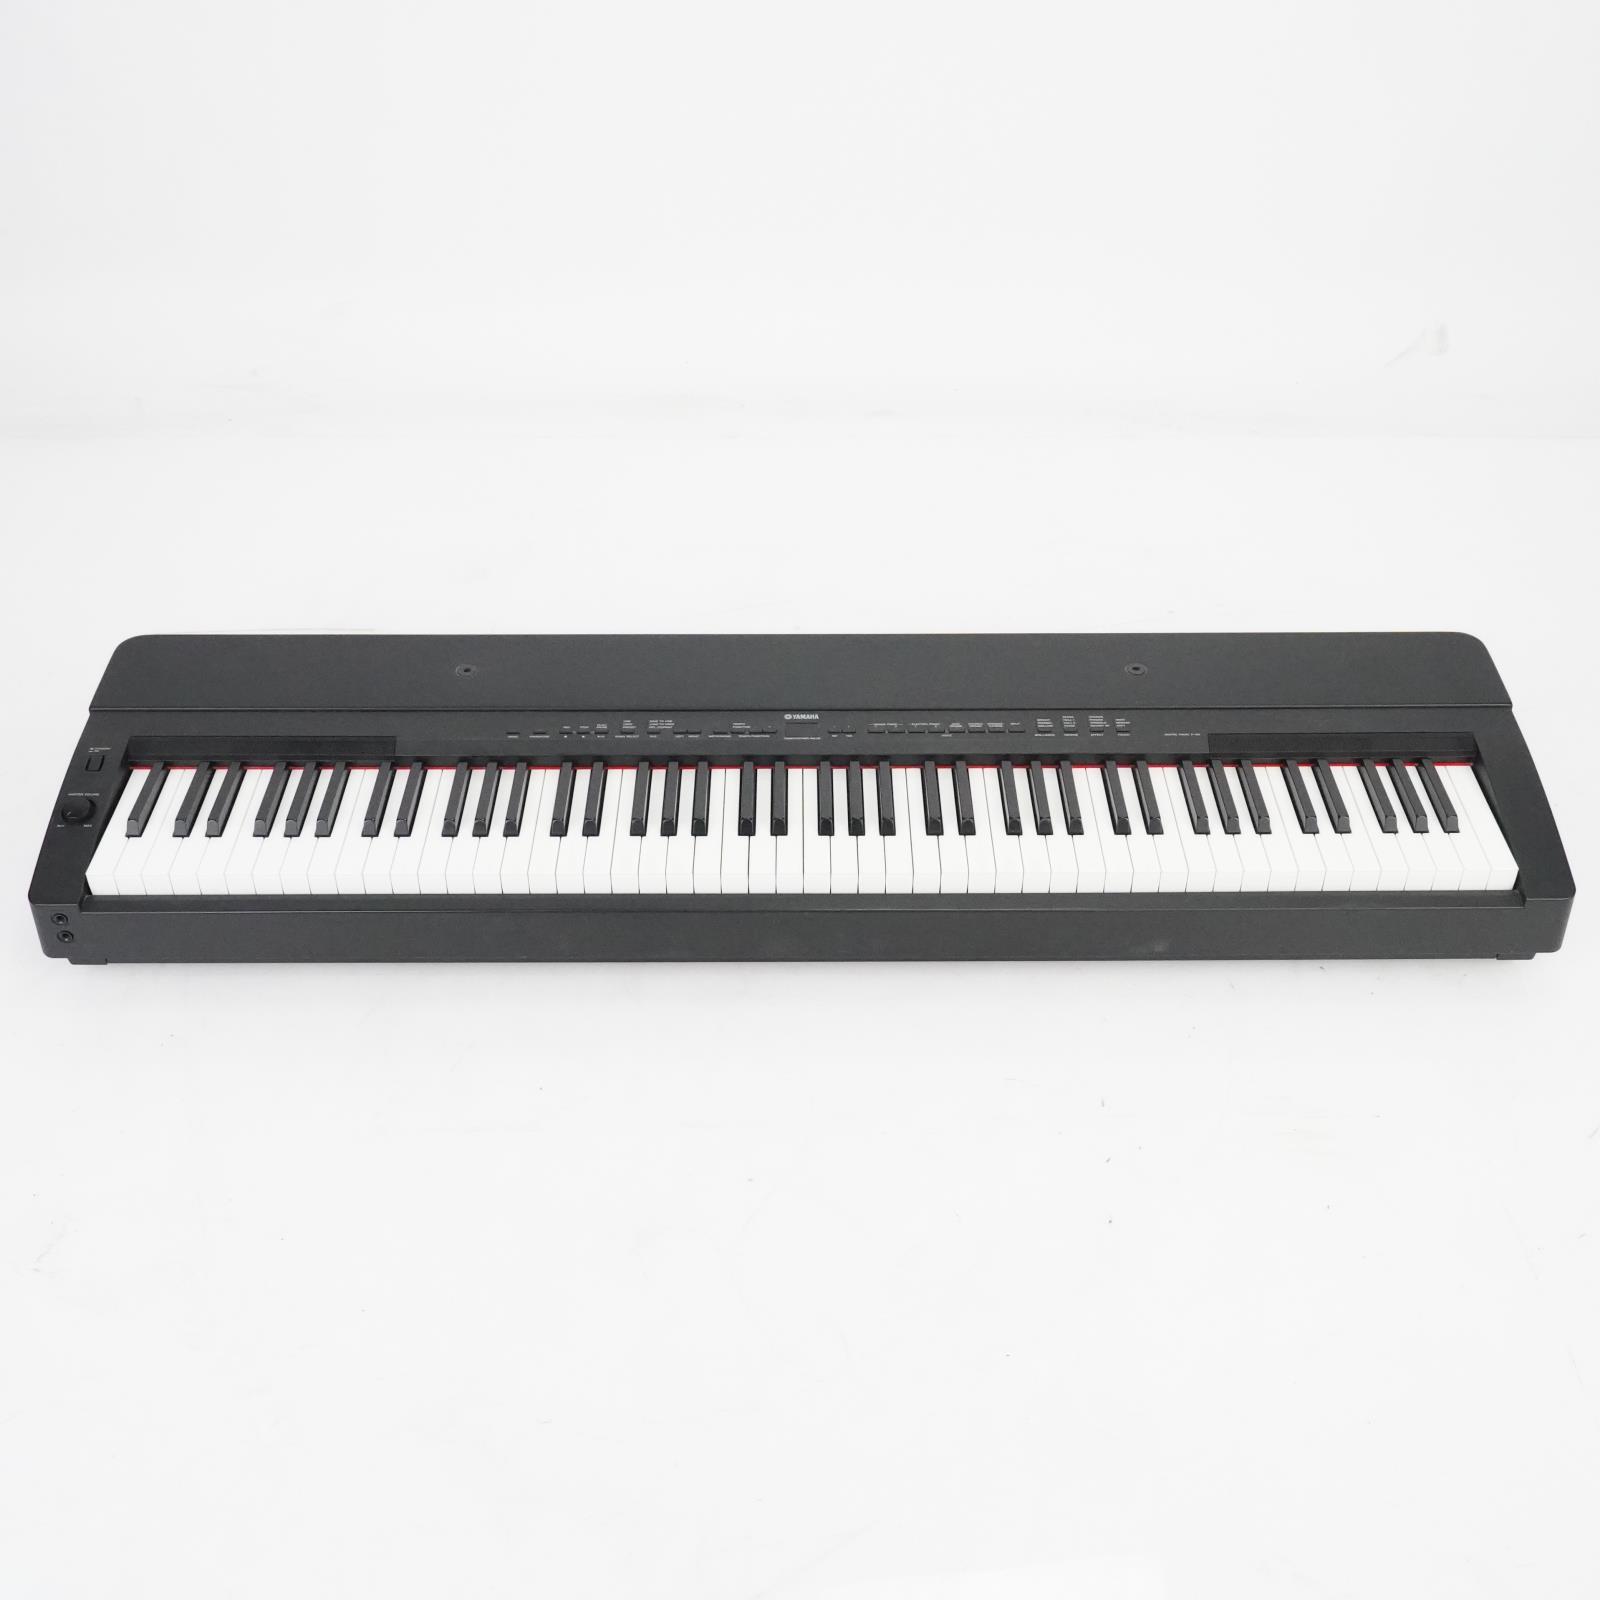 Yamaha  P-155B P-155 88-Key Digital Piano Keyboard John Corey The Who #38986